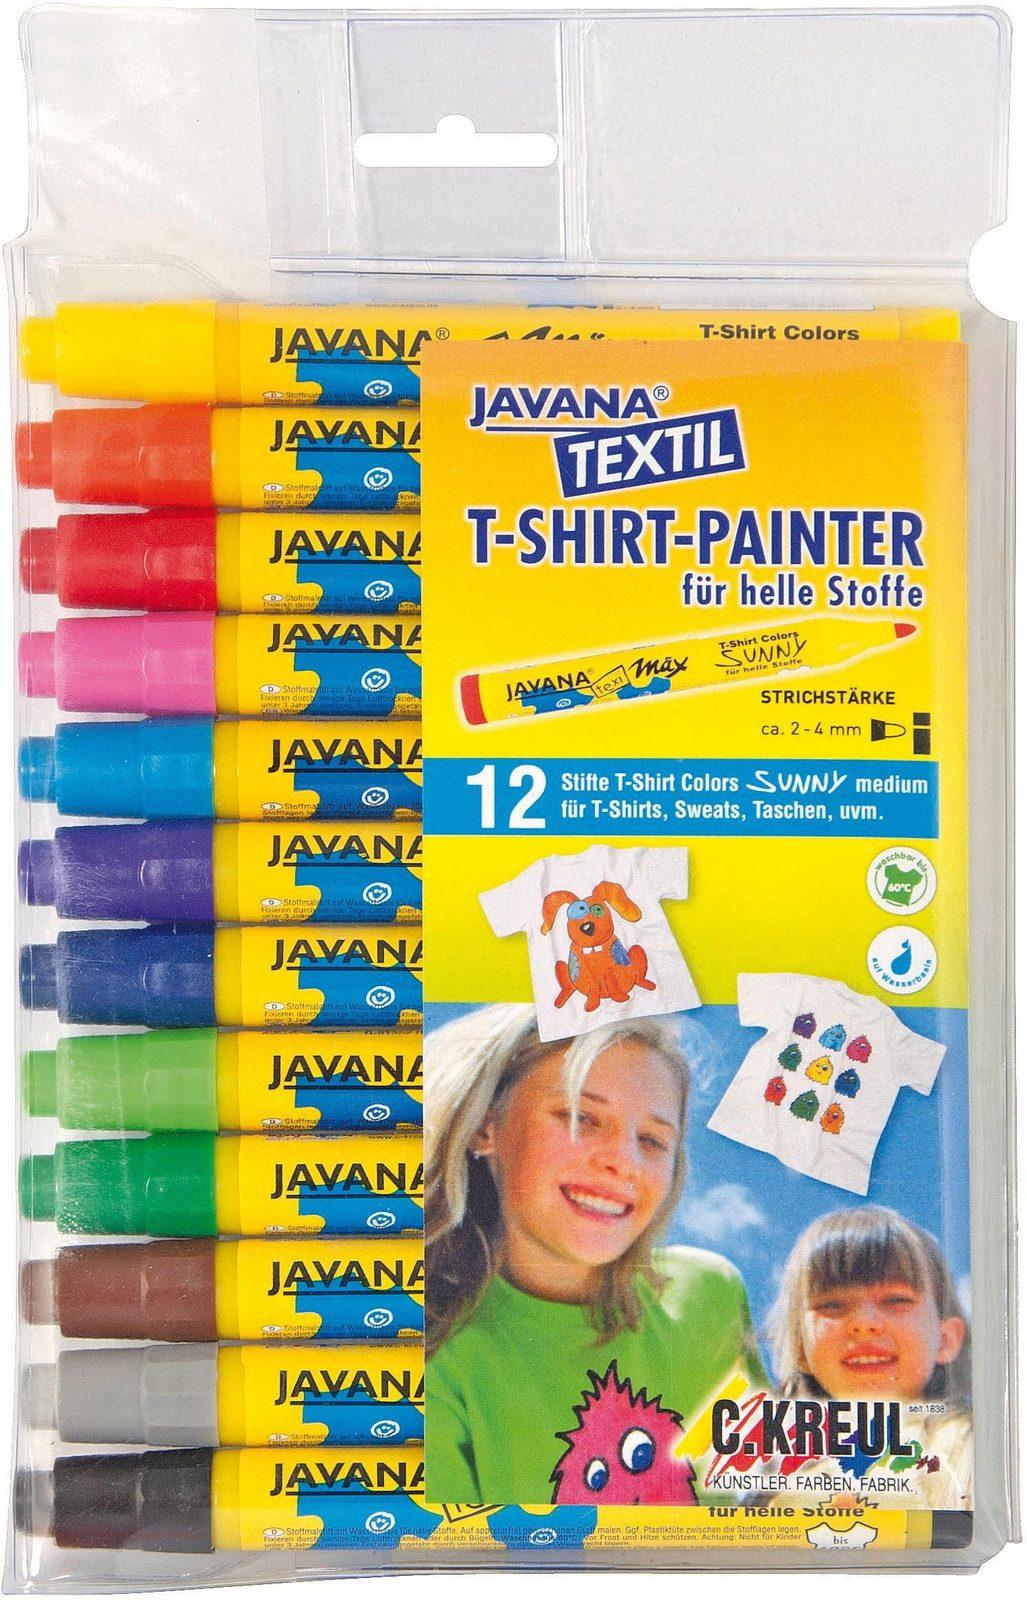 KREUL Textilstifte, »Javana, texi mäxi Sunny medium für helle Stoffe 12er Set «